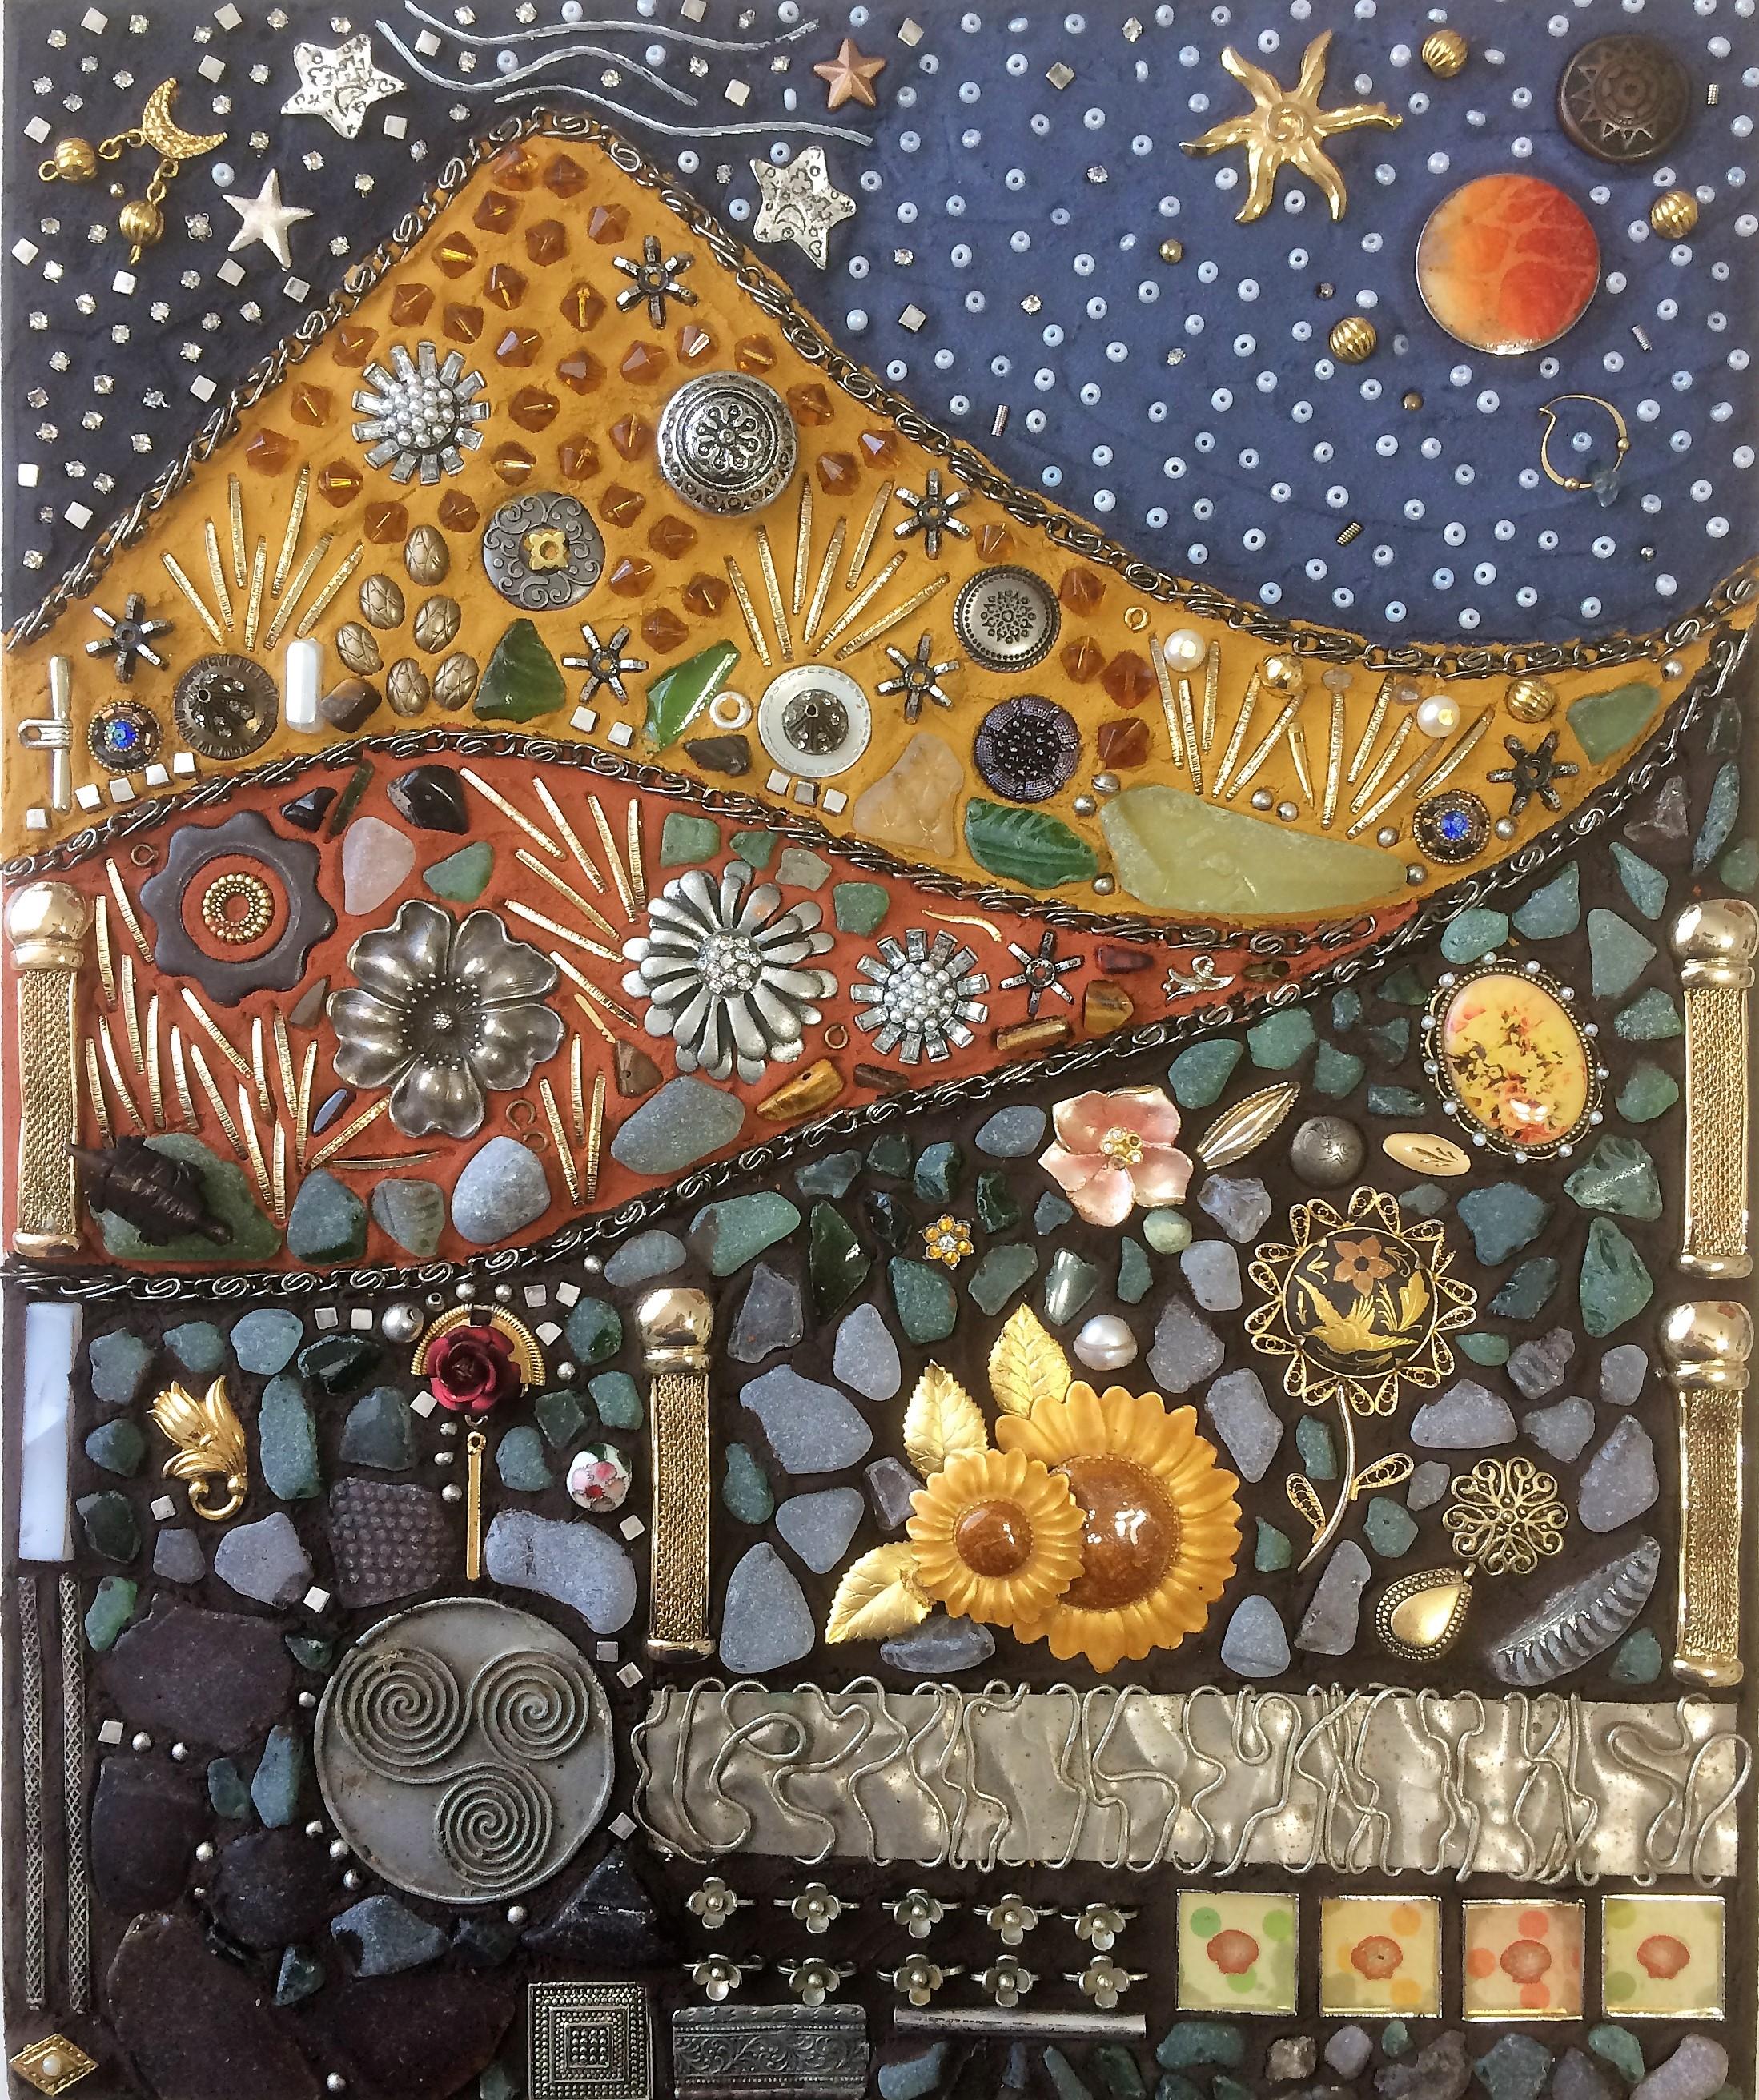 Tapestry method to create this garden Nirvana.